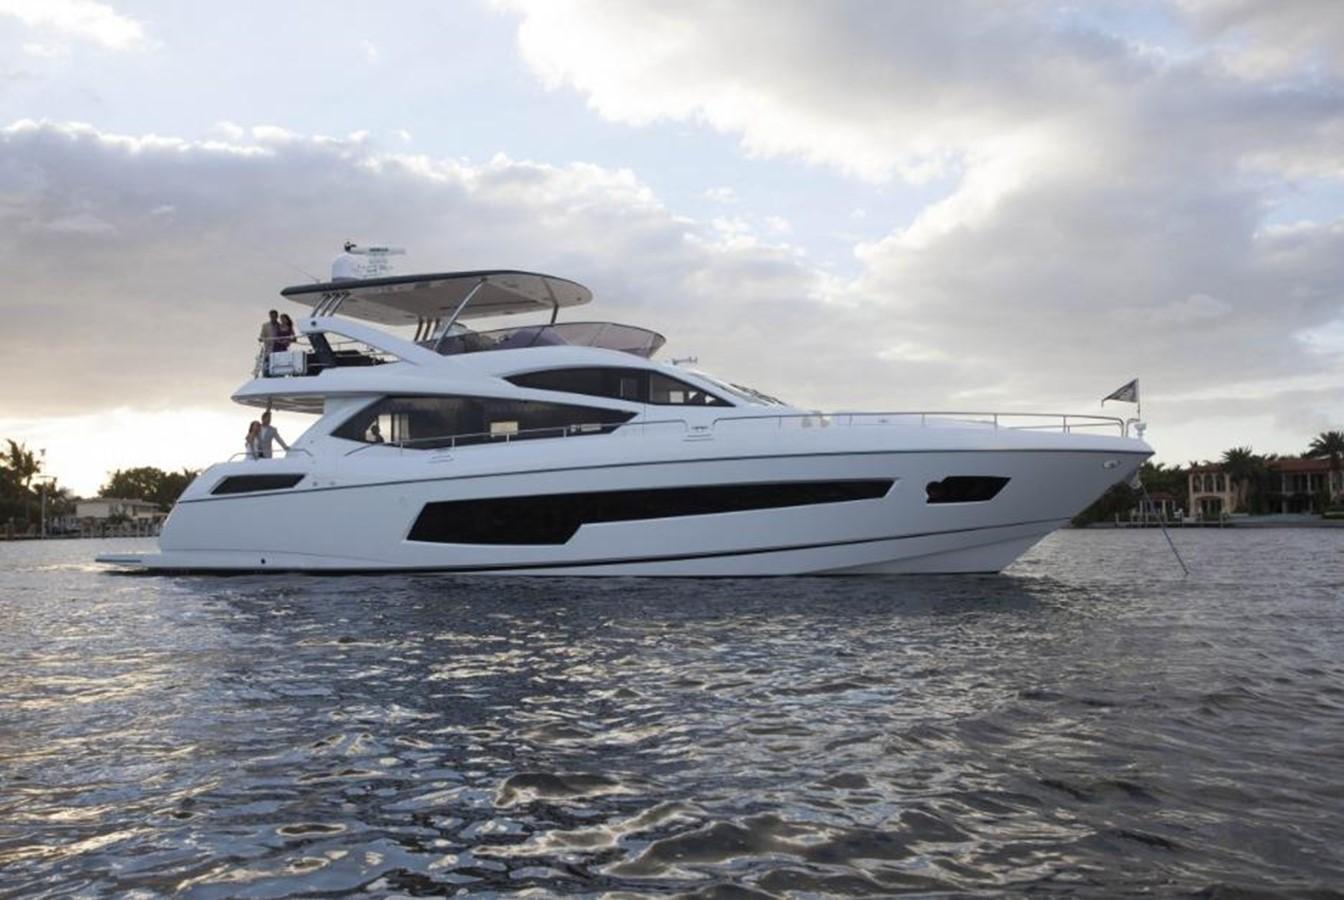 2017 Sunseeker 75 Yacht For Sale